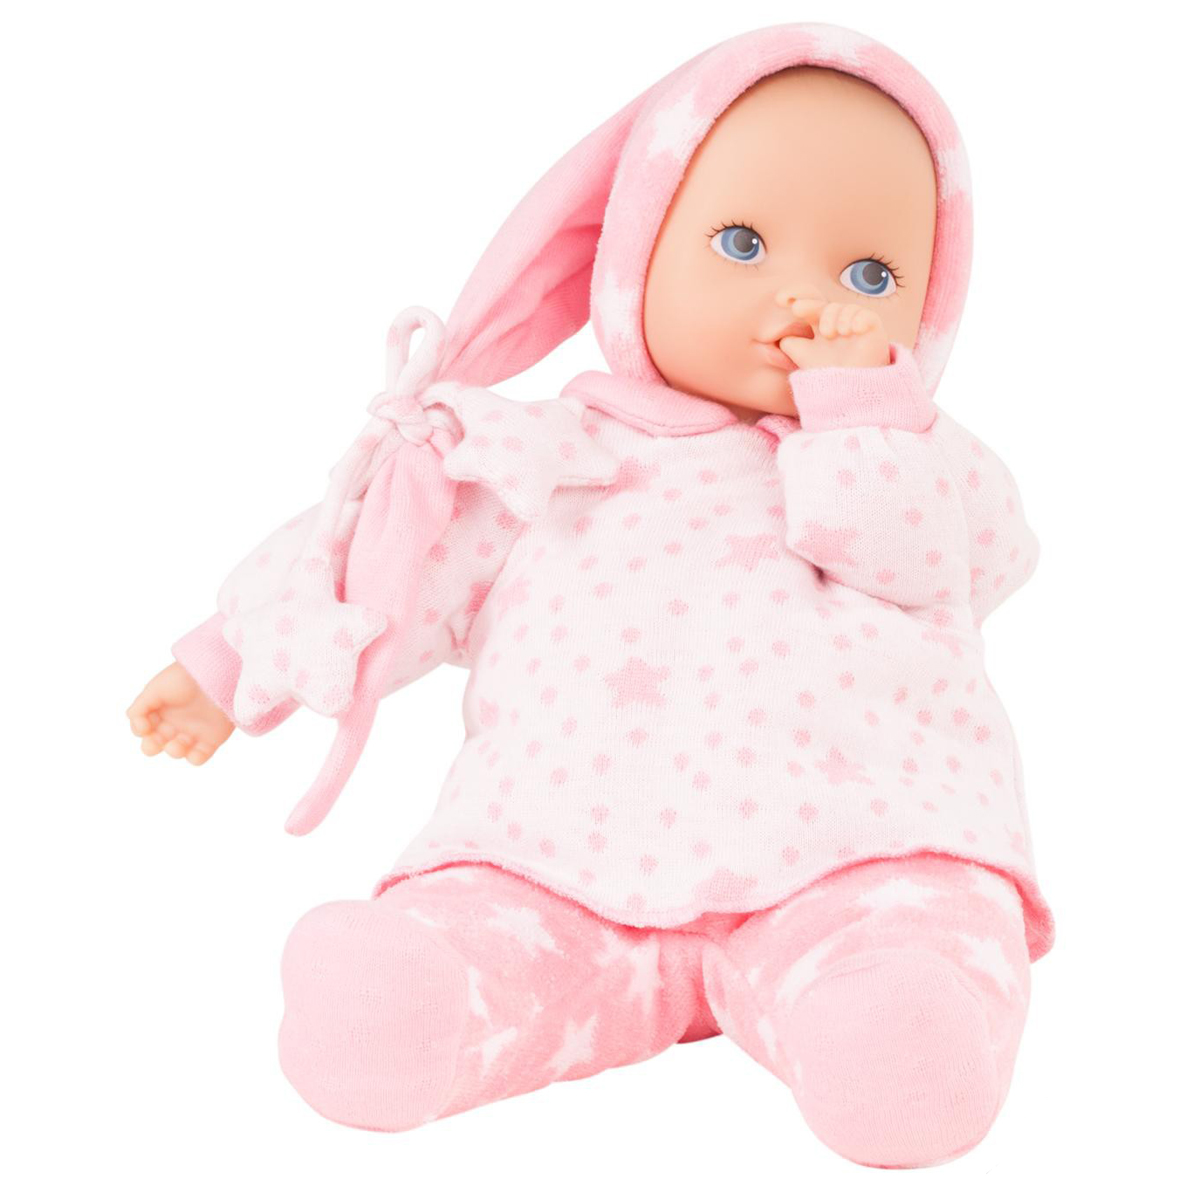 Кукла Baby Pure - Малышка от Toyway